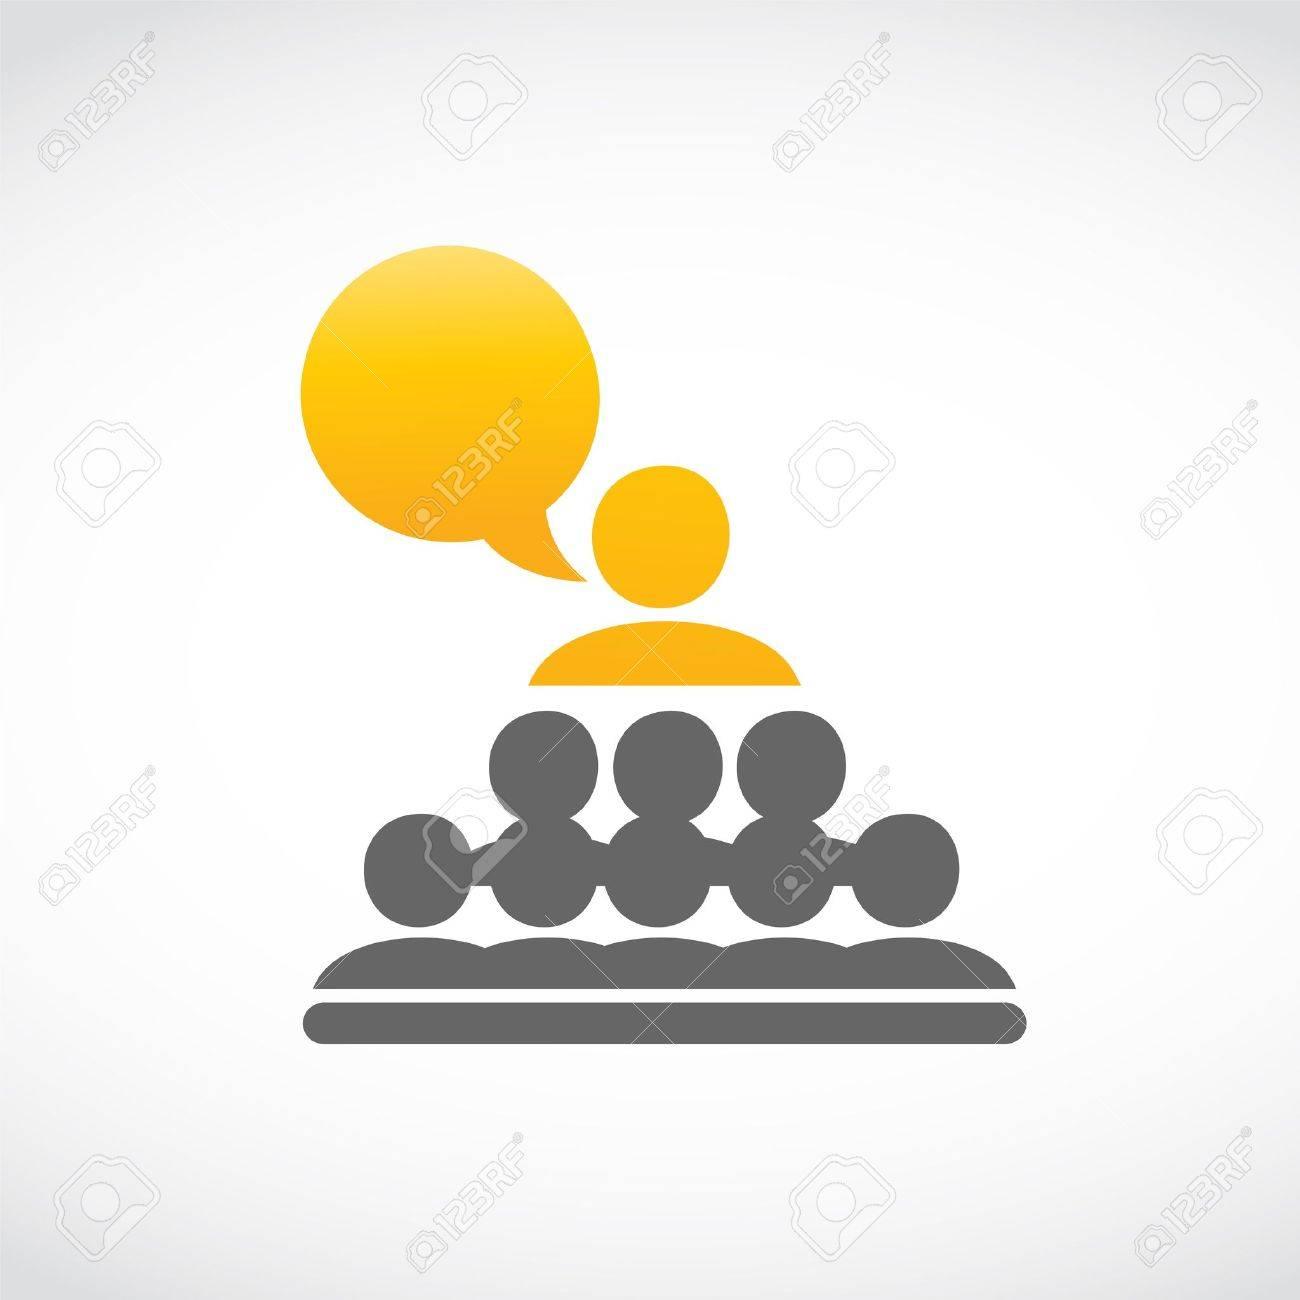 business conference, presentation - 15600435